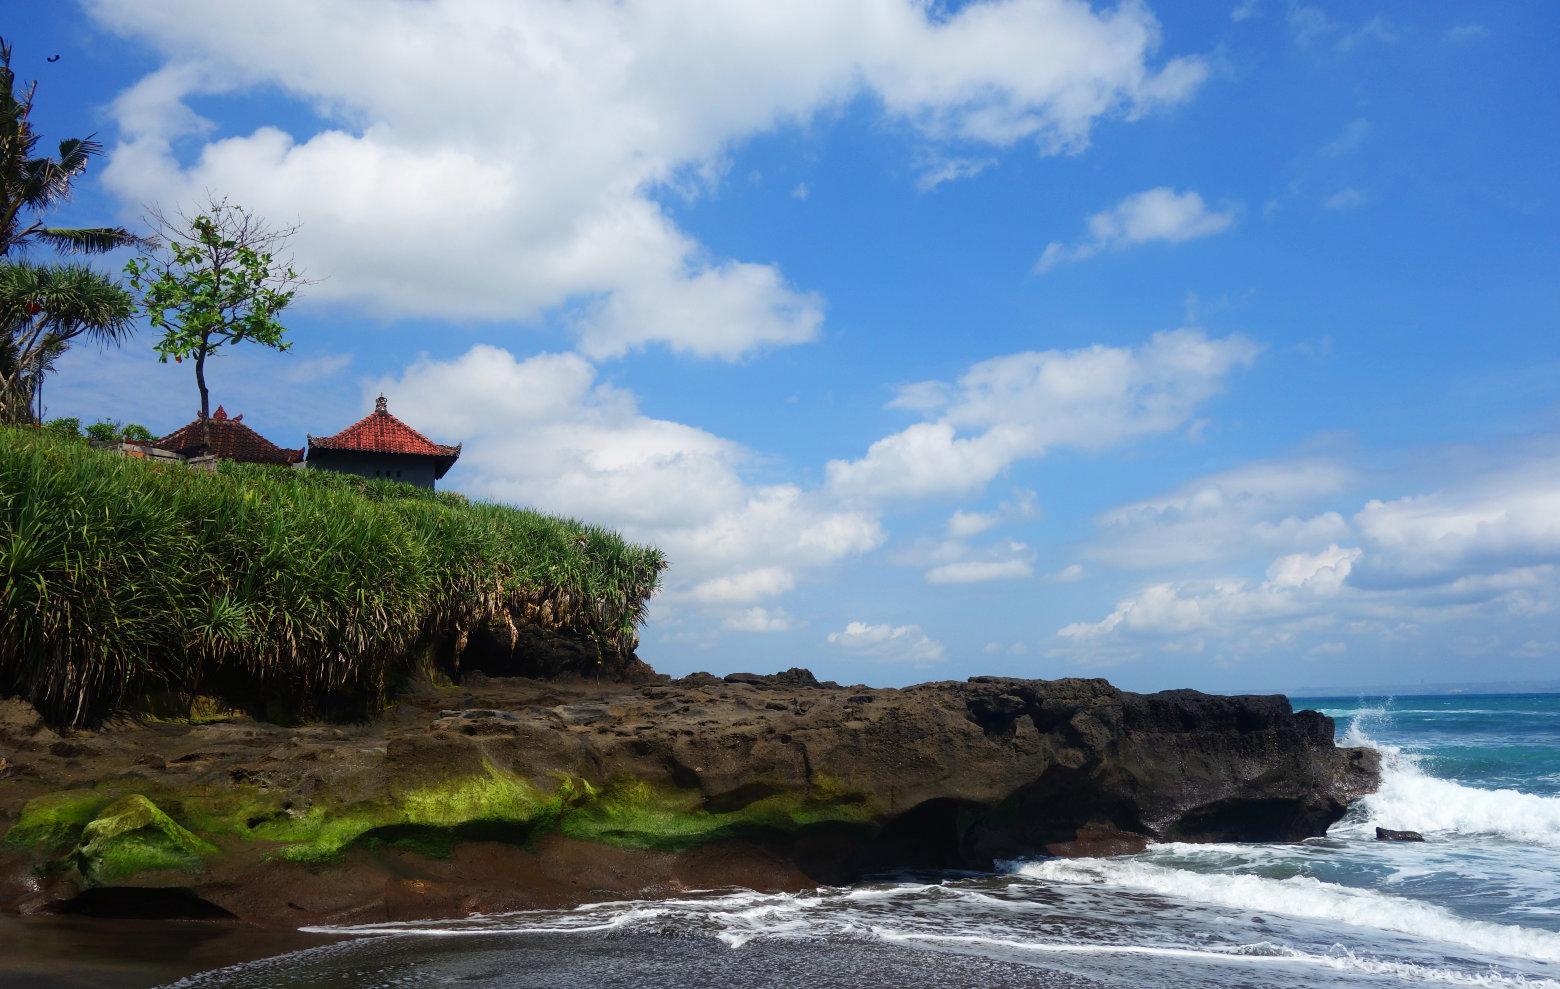 Bali Canggu Klippen Tempel und Meer